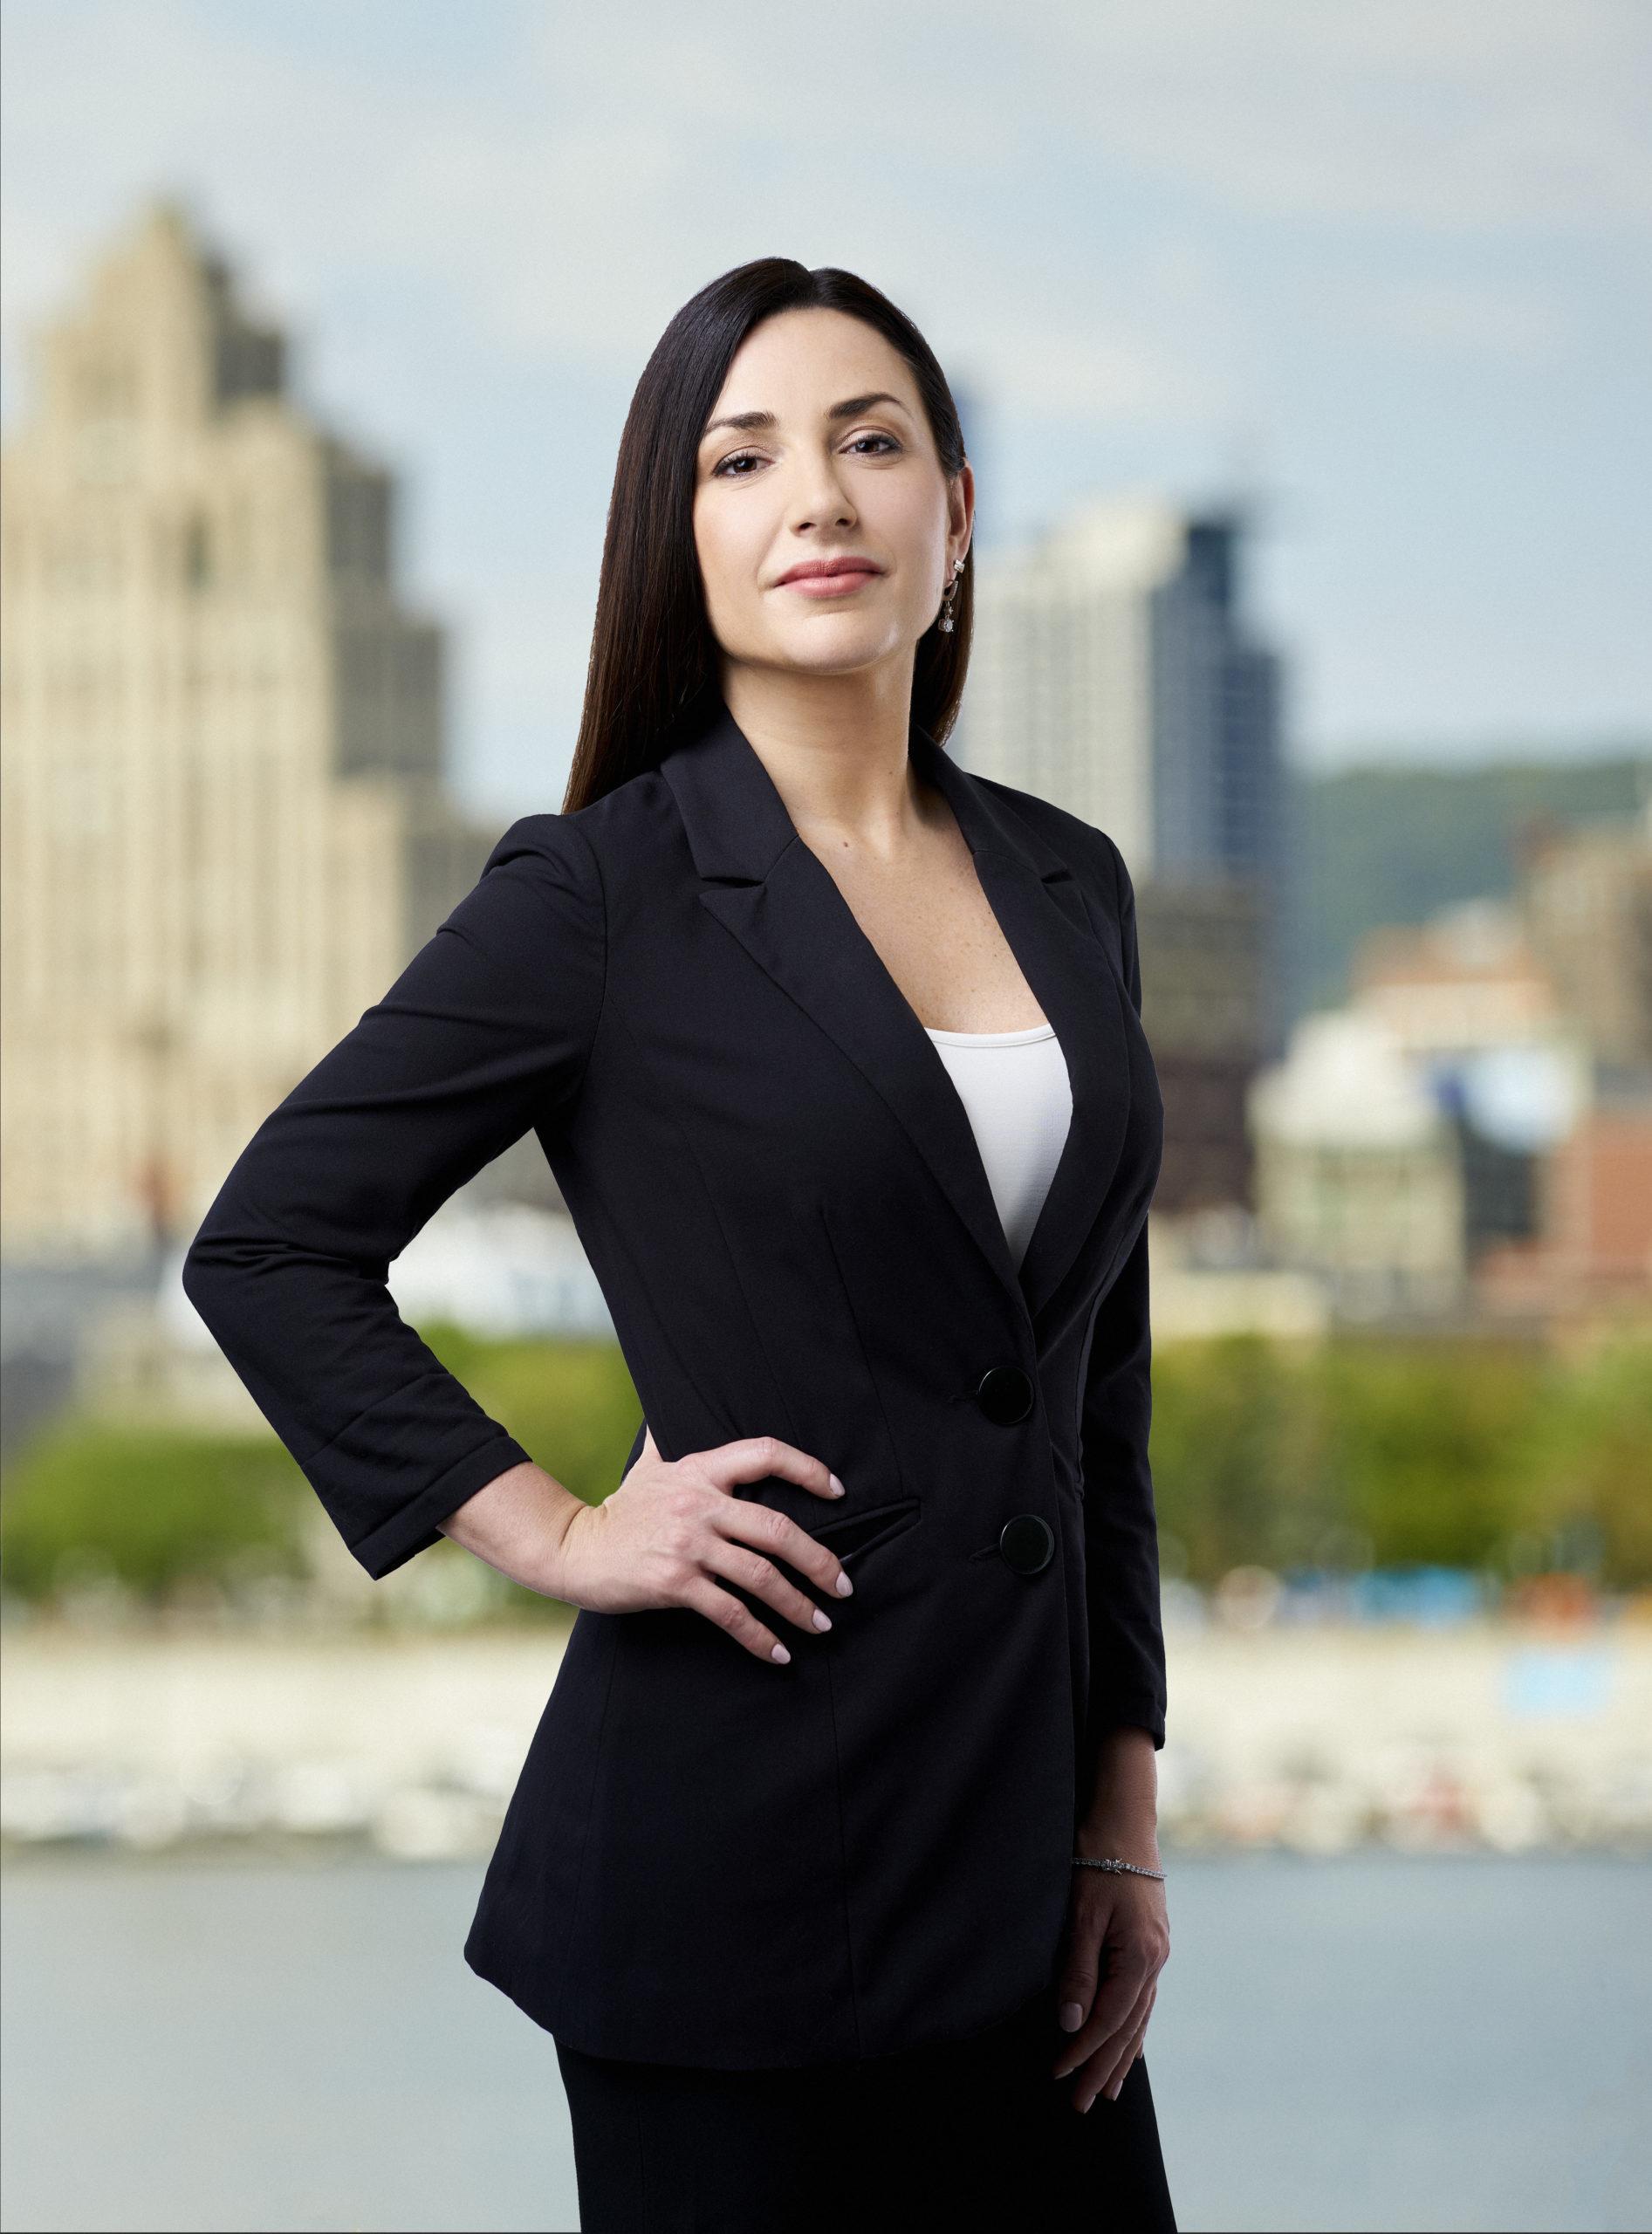 Marcia San Juan - Courtier Immobilier - Équipe YESARRAZIN